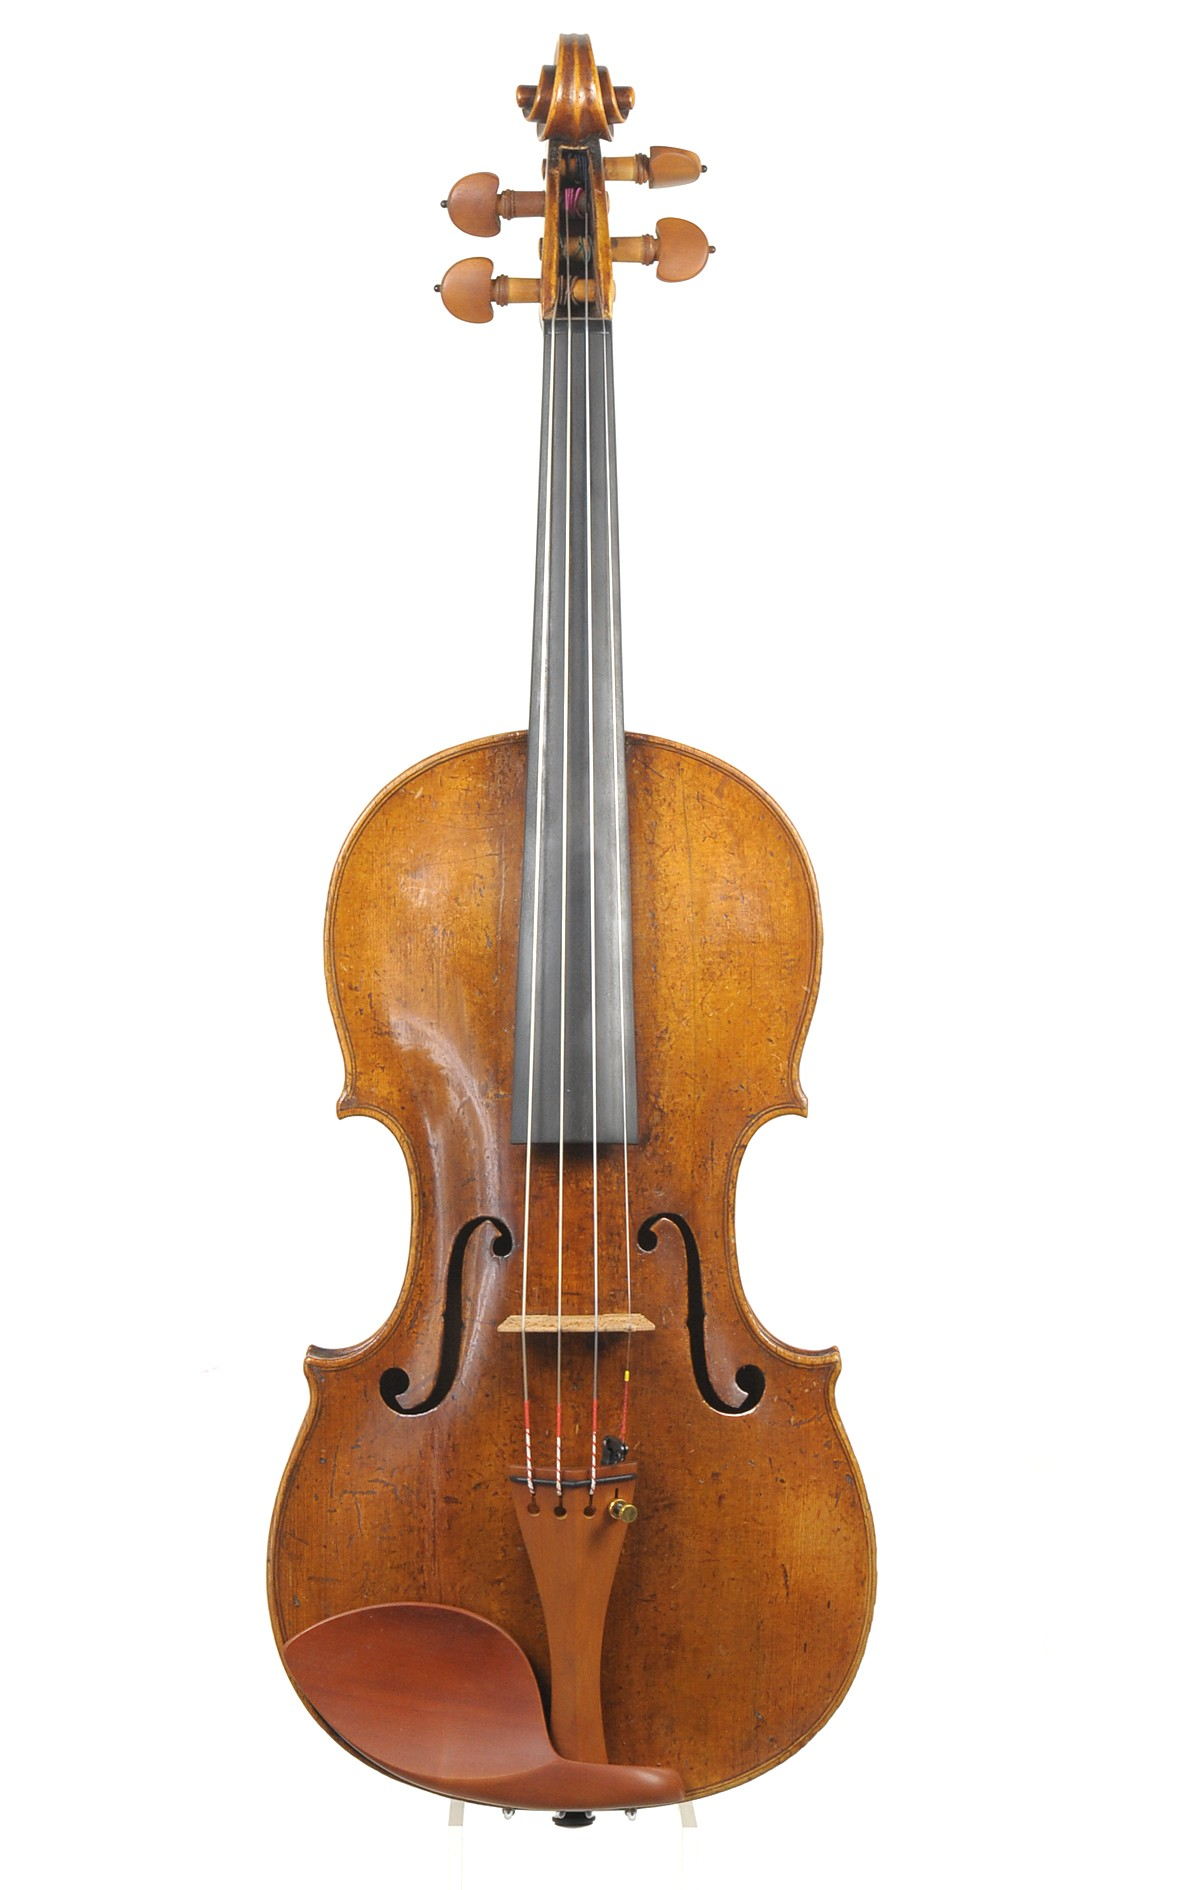 Fine Mittenwald violin after Aegidius Kloz, c.1800